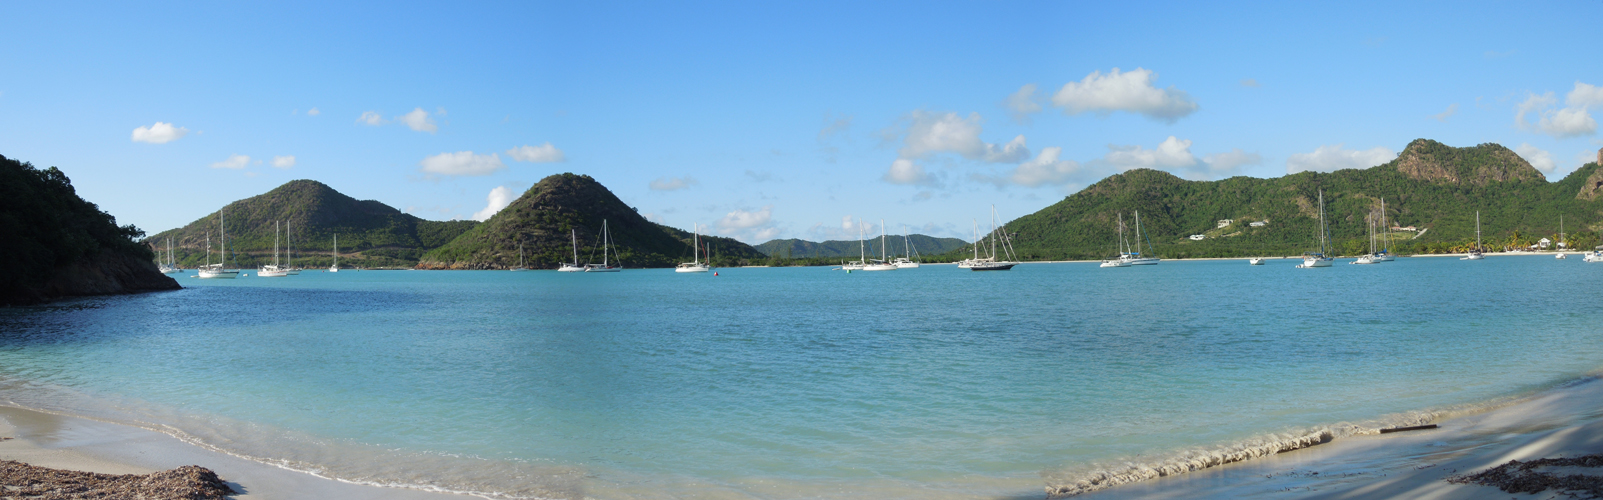 Panorama Jolly Harbour Bay